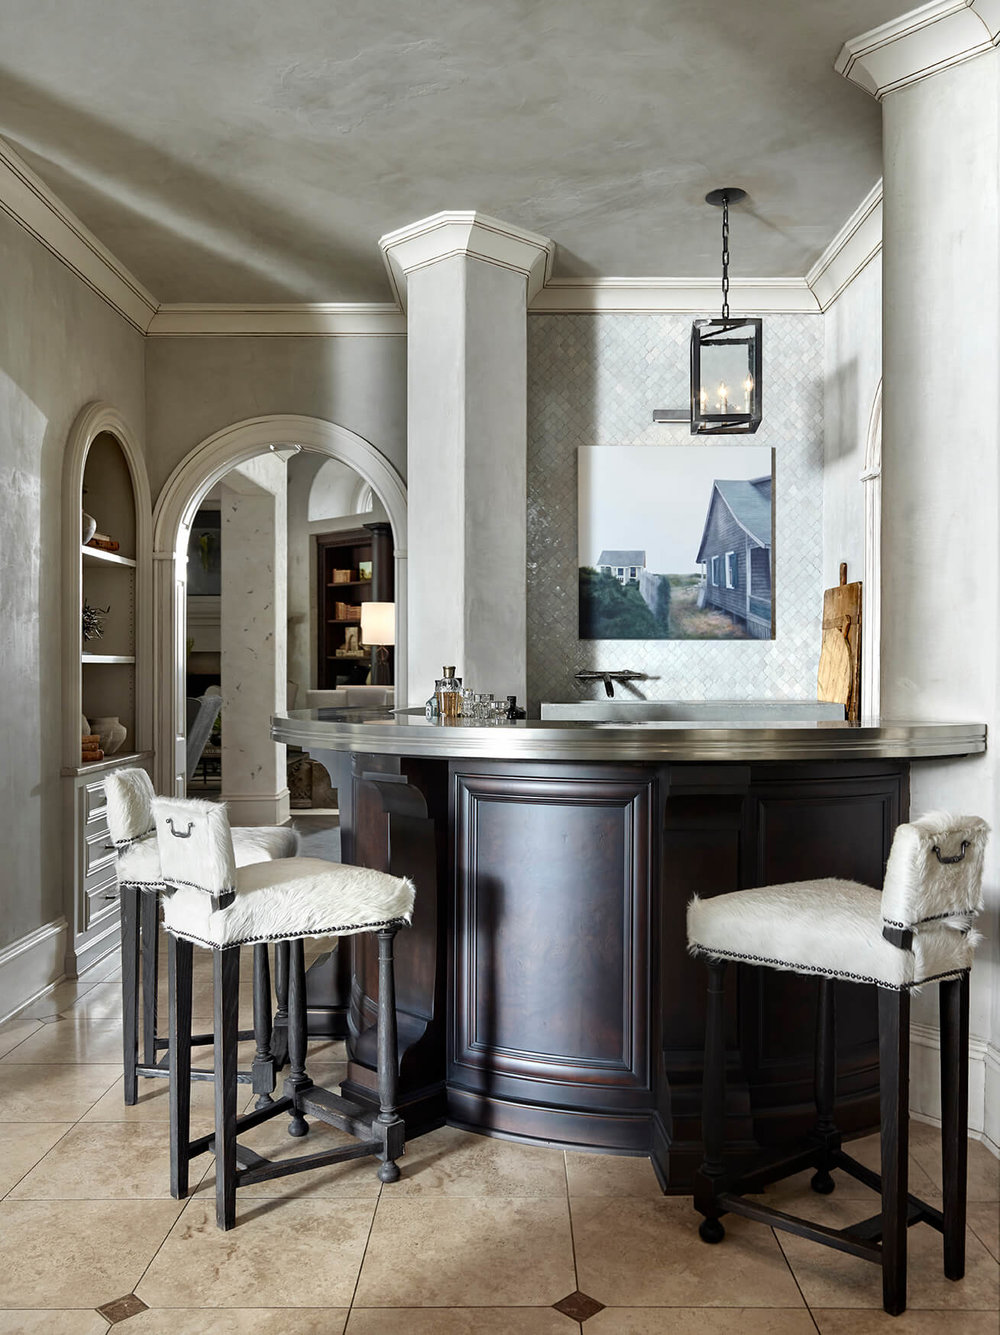 bar-area-fur-bar-stools-formal-transitional-bureau-interior-design-nashville-tn.jpg